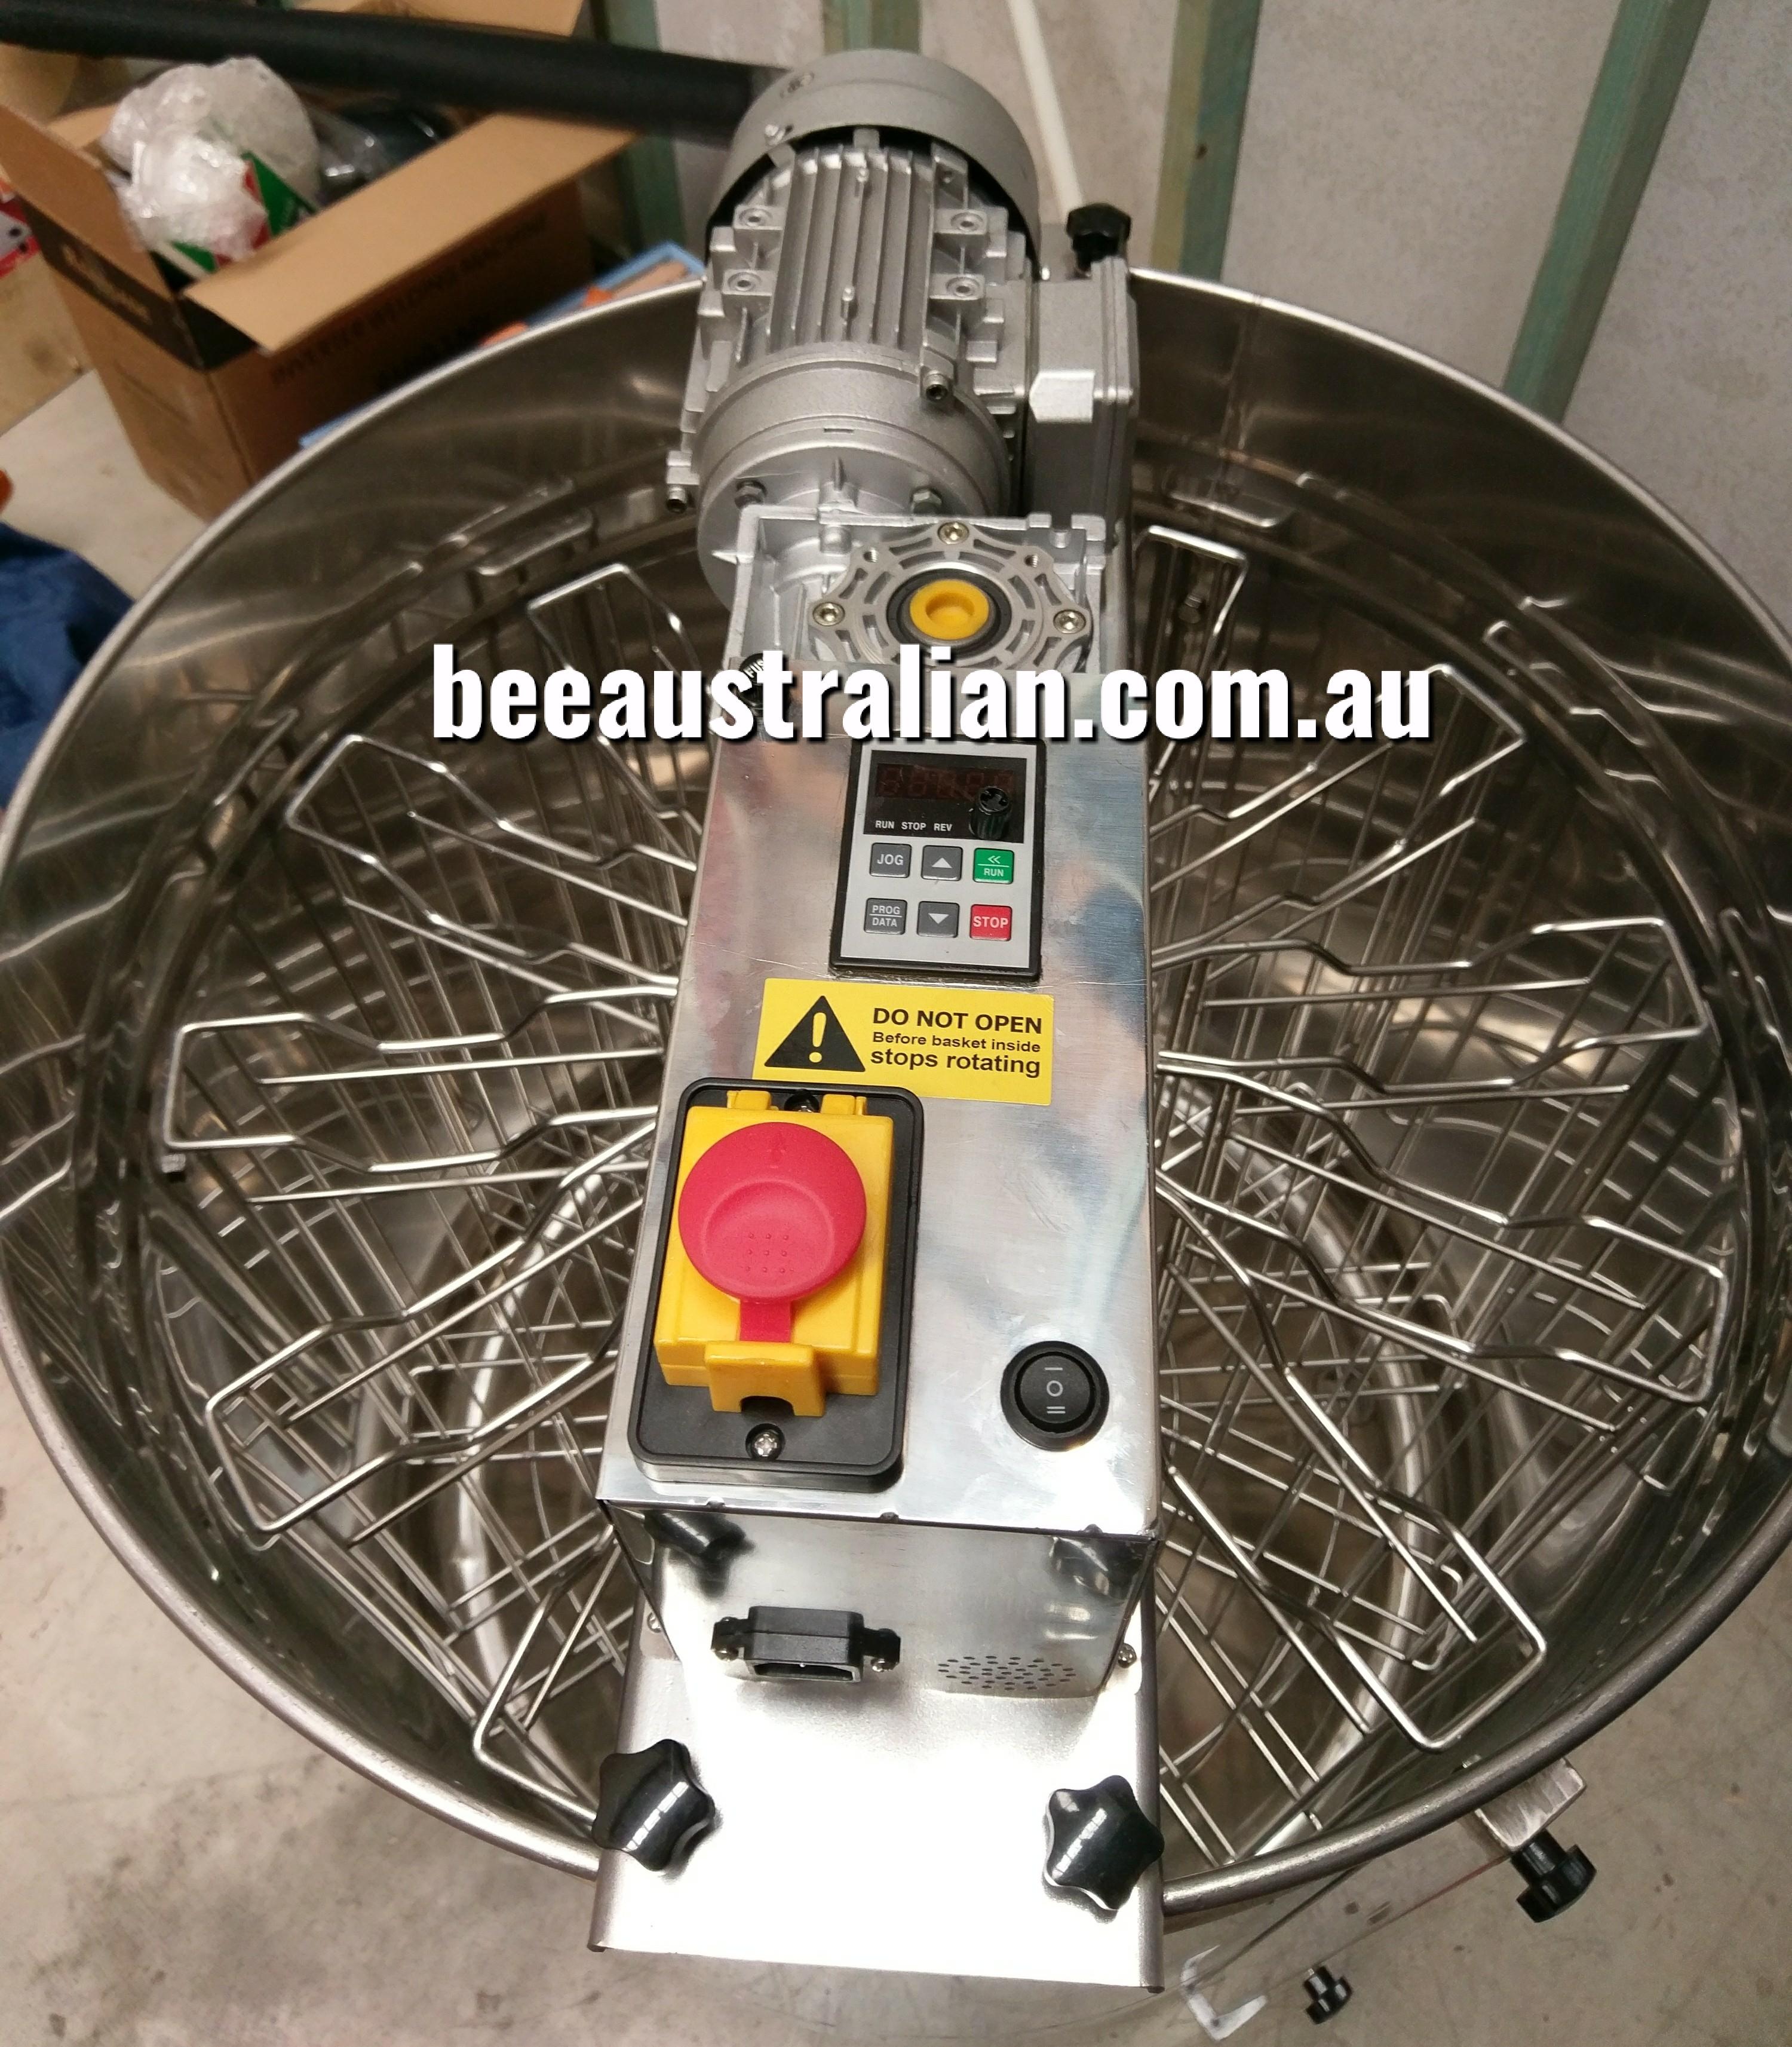 14aa8bab1e2 Bee Australian 12 Frame Reversible Electric Honey Extractor - Bee Australian